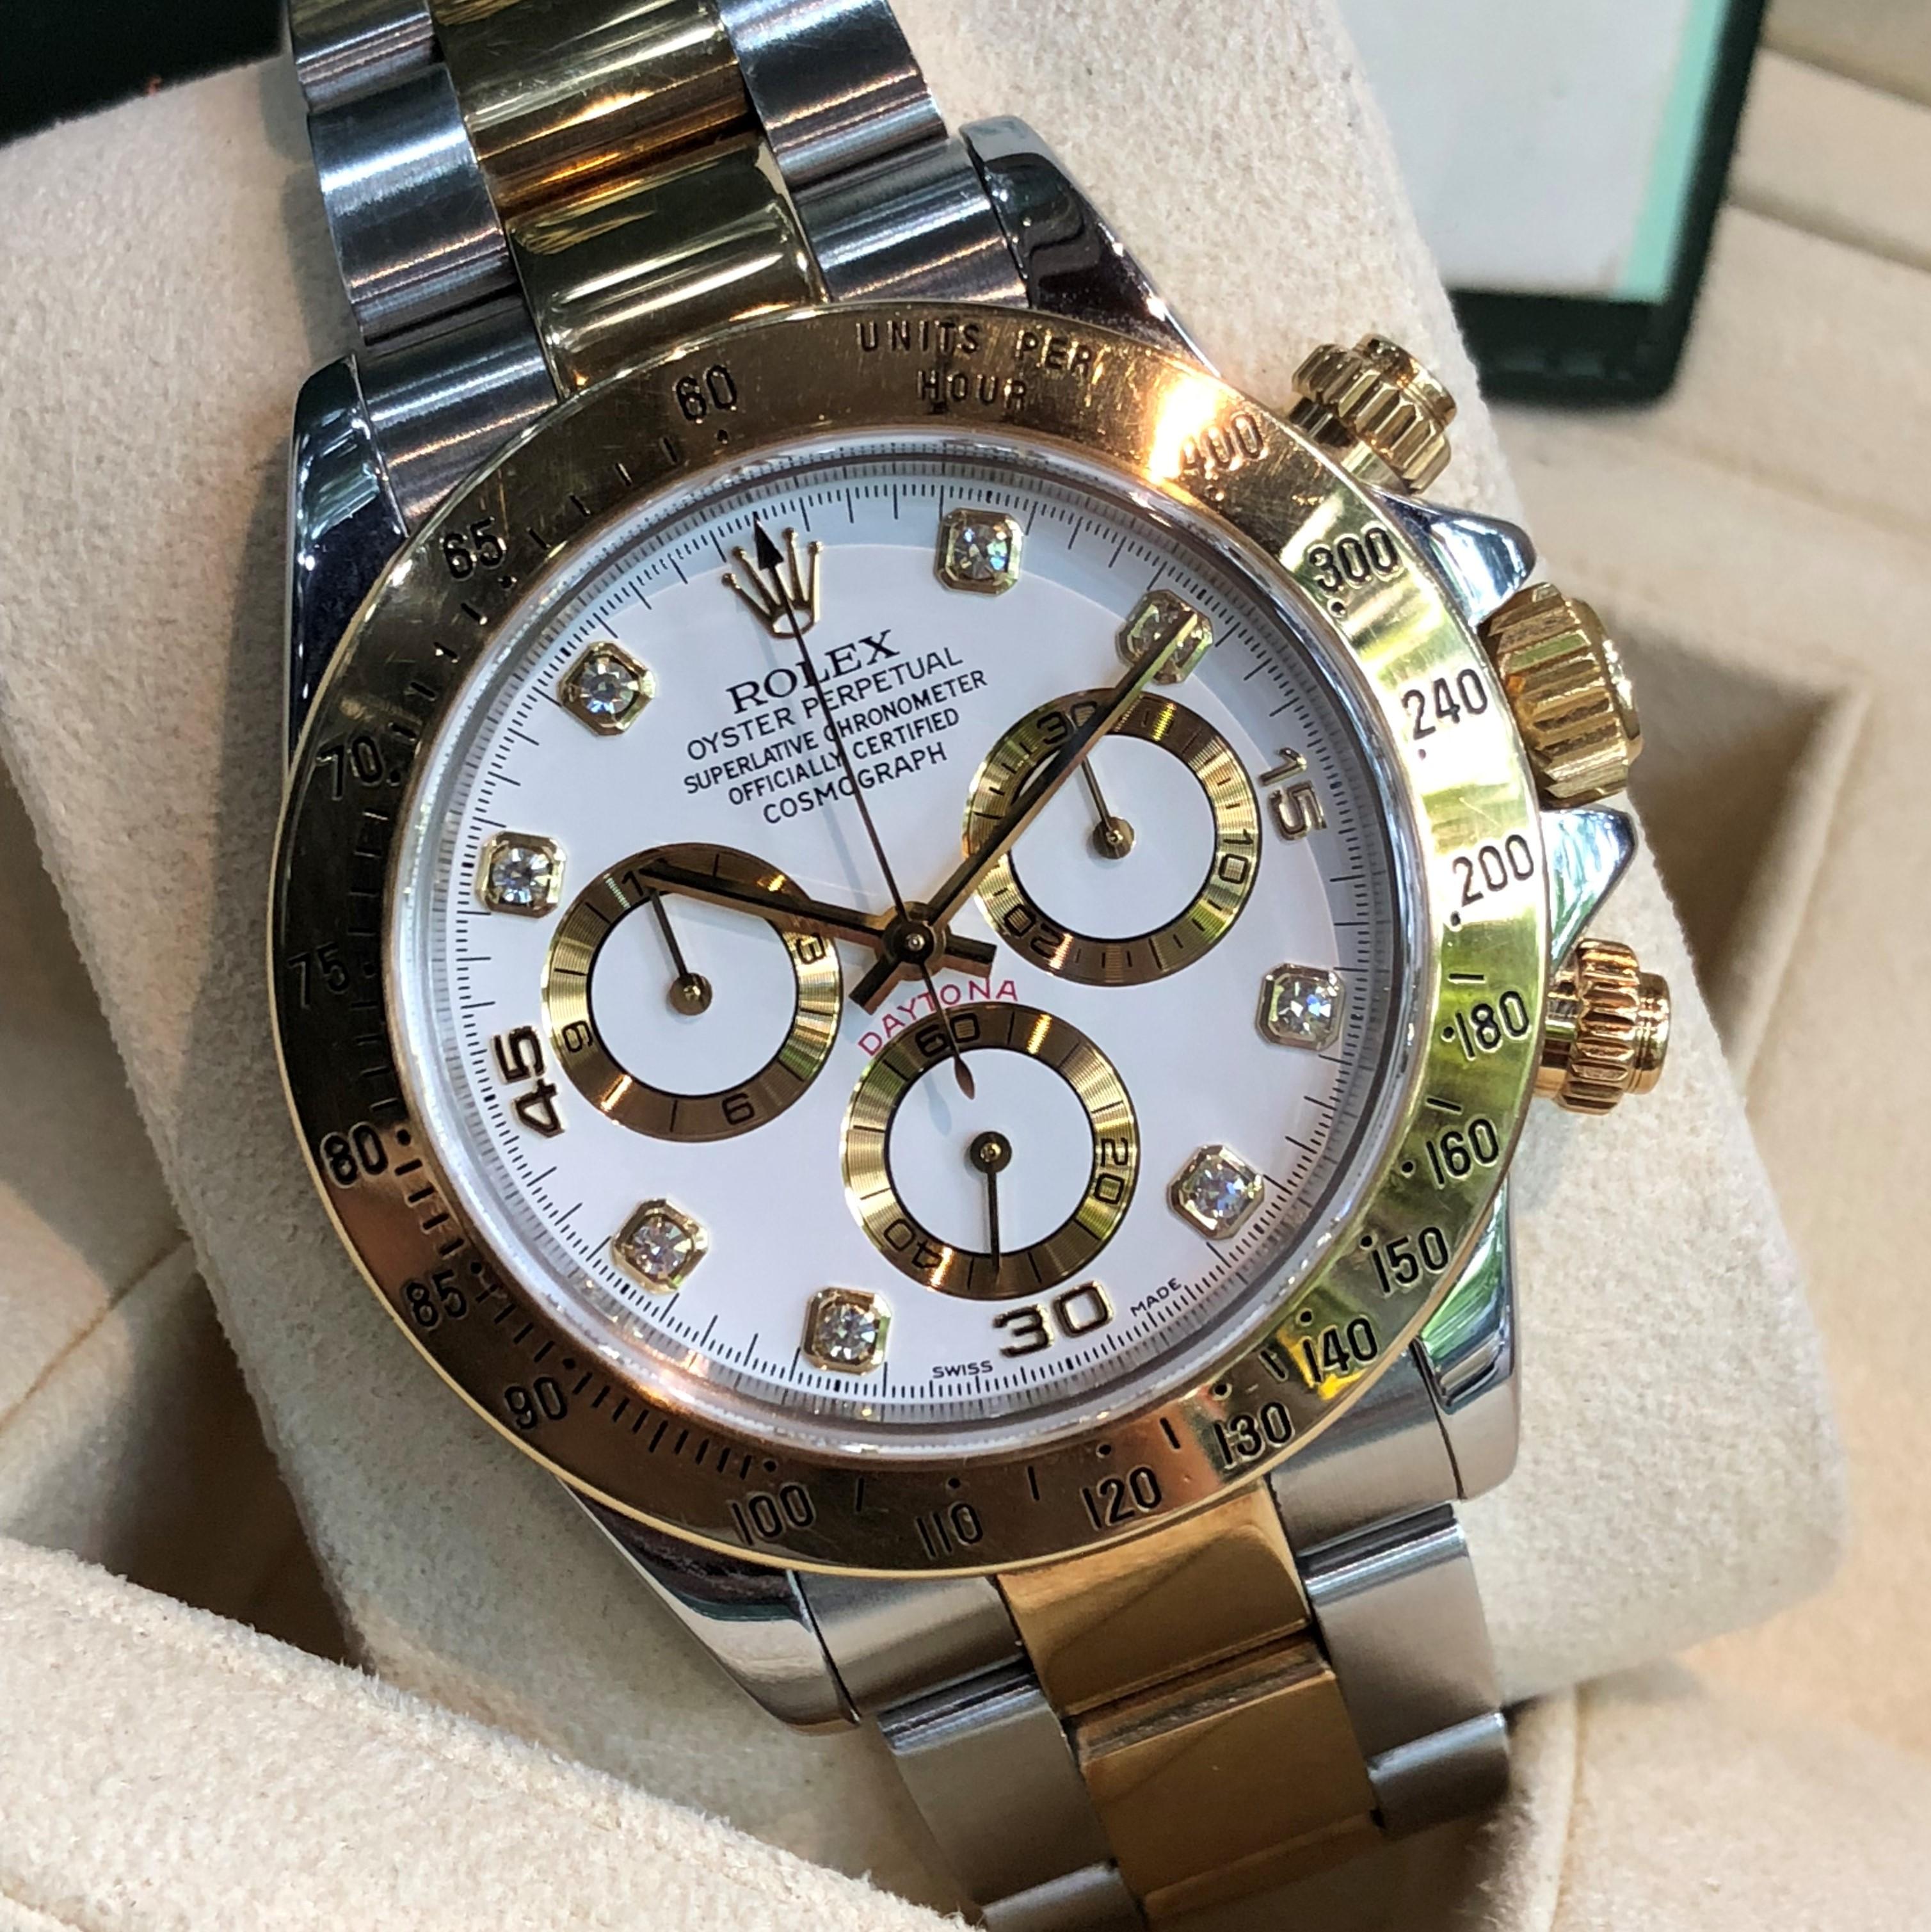 Rolex Daytona 116523 Mặt trắng men Demi vàng 18k Size 40mm